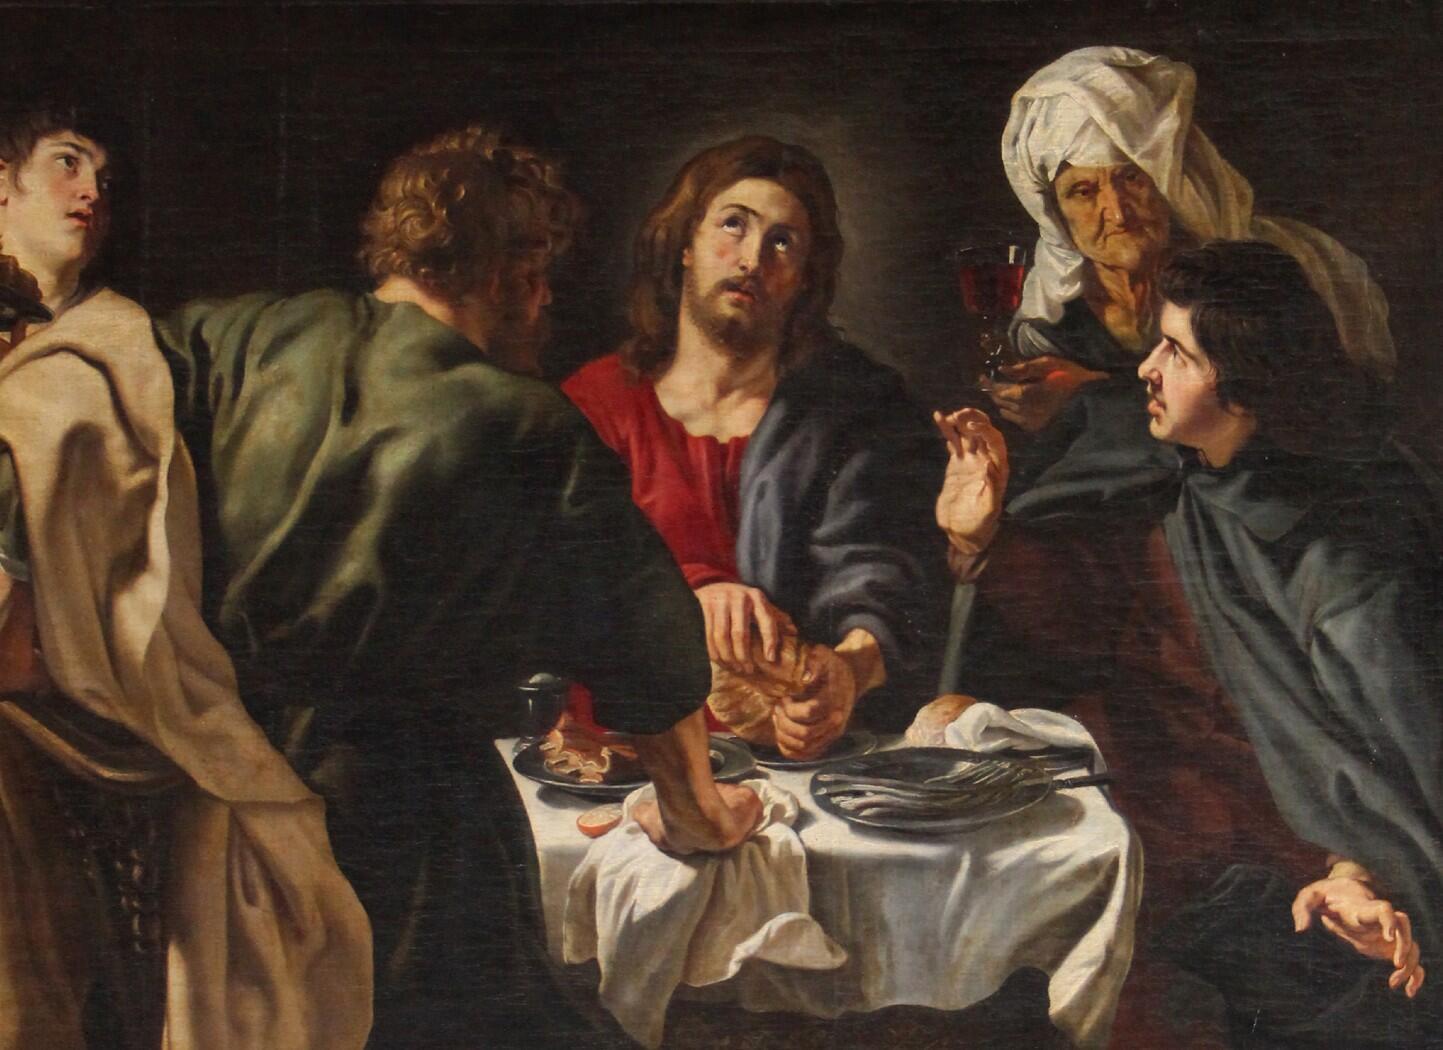 """The Disciples of Emmaus"" by Dutch painter Peter Paul Rubens, at the church of Saint-Eustache in Paris."